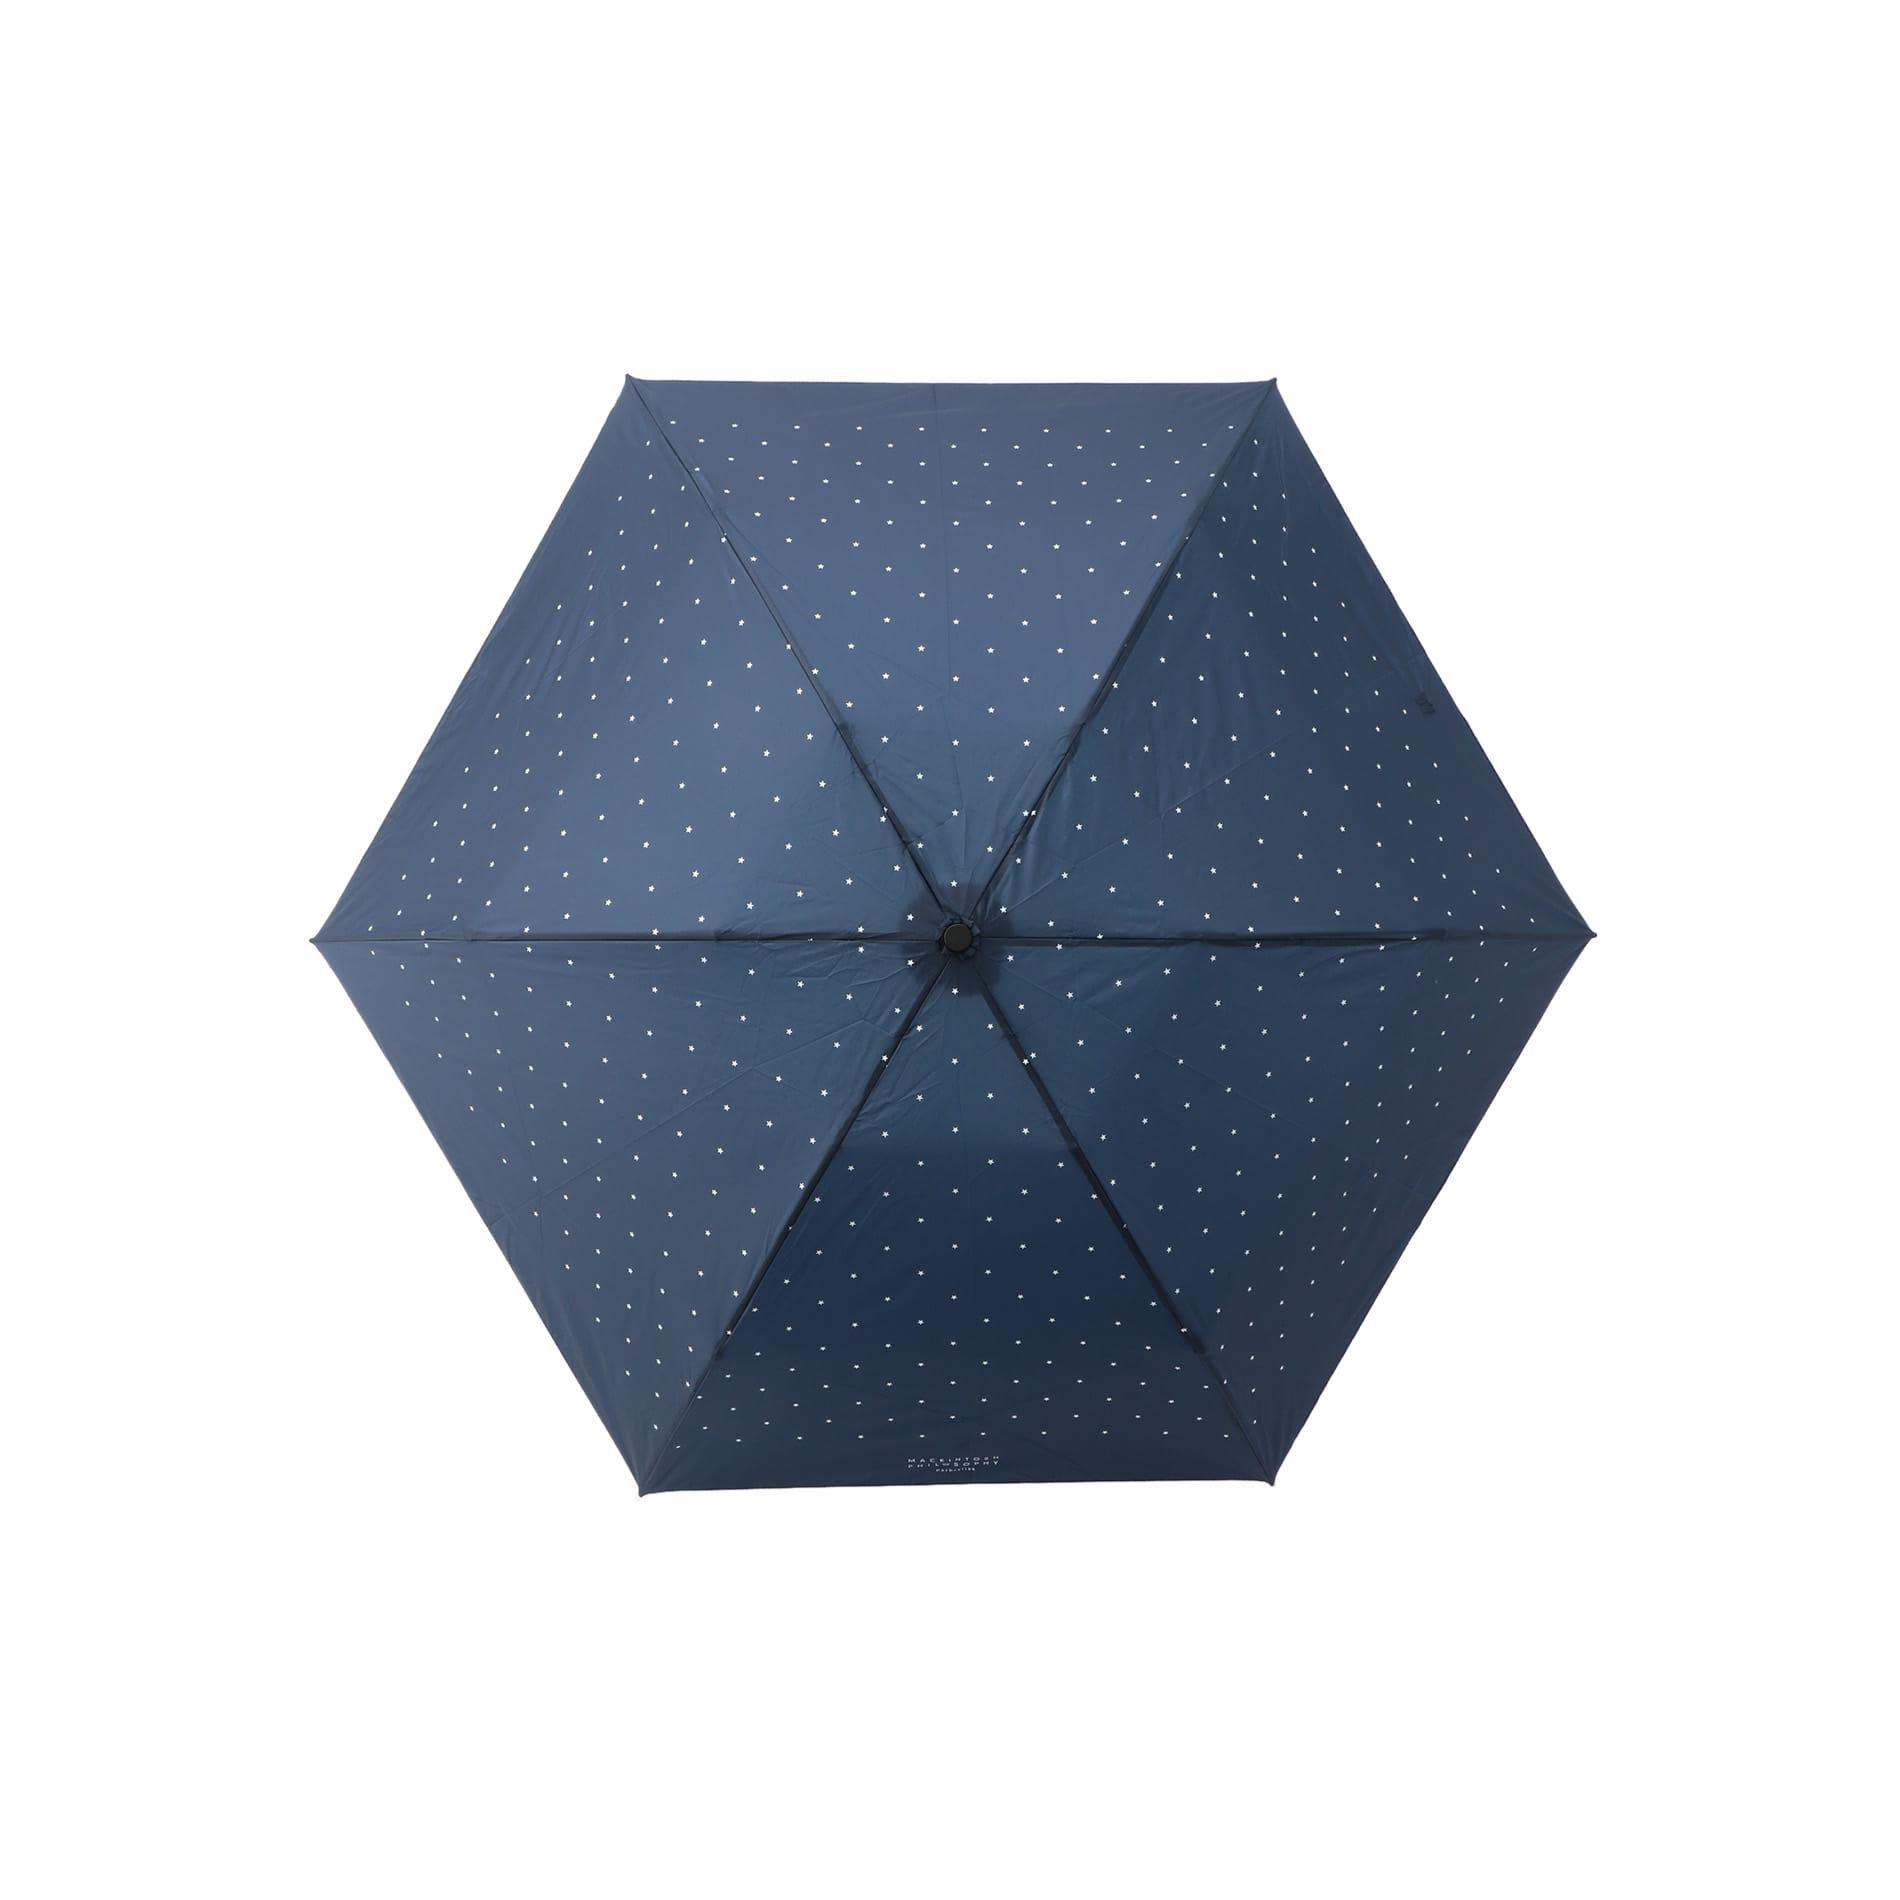 【Barbrella®】50cmタイプ 軽量ミニ傘 星柄